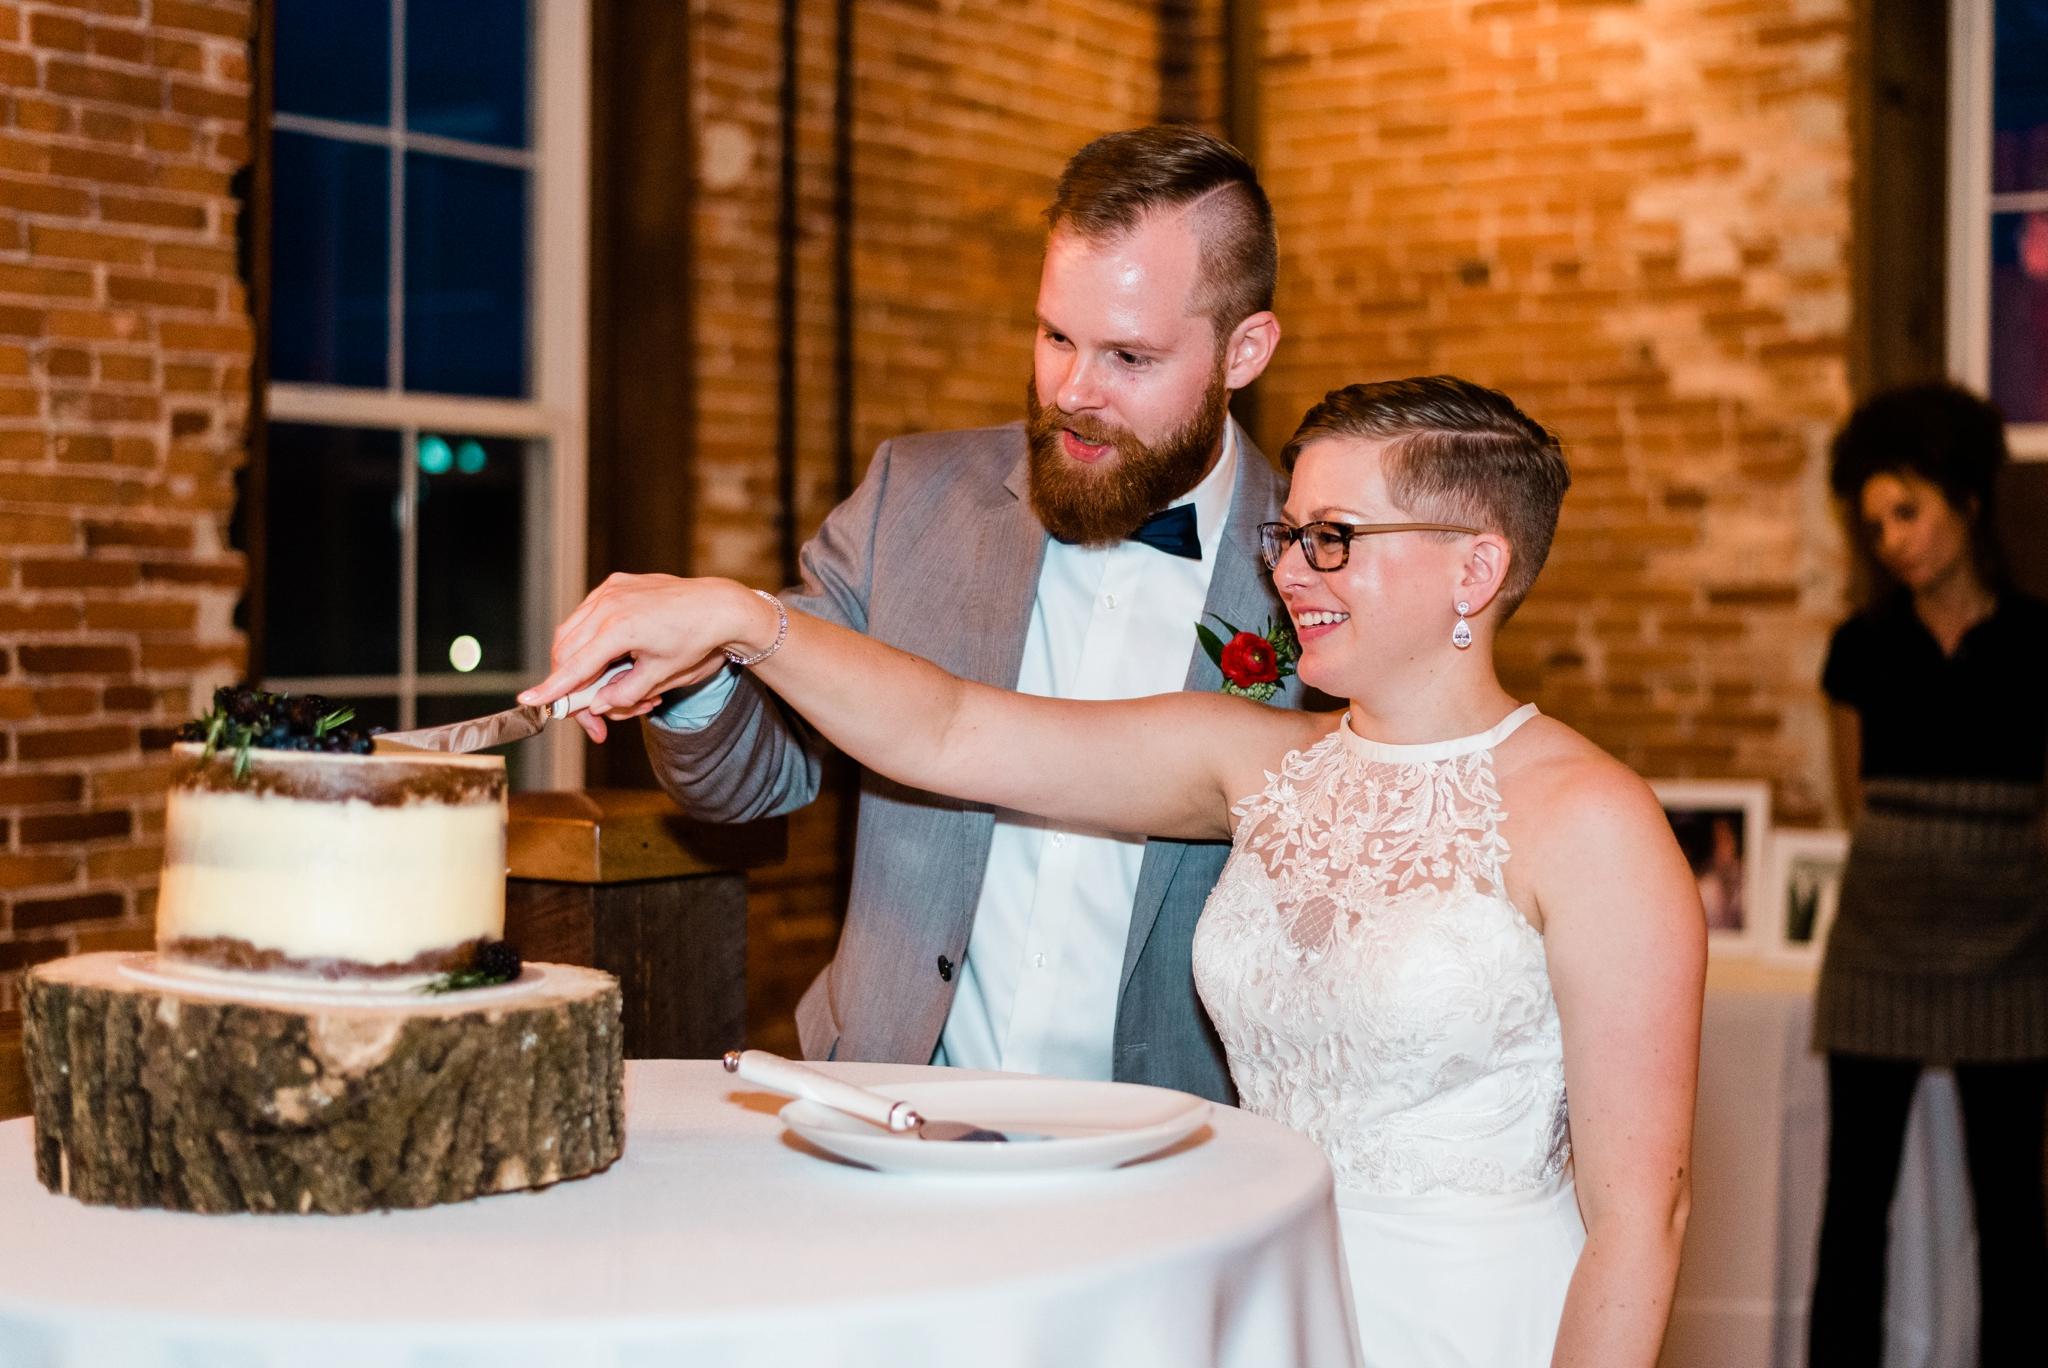 Emily Grace Photography, Lancaster PA Wedding Photographer, The Booking House Wedding Venue, Manheim PA Wedding Venue, The Booking House Manheim Cake Photos, Central PA Wedding Photographer